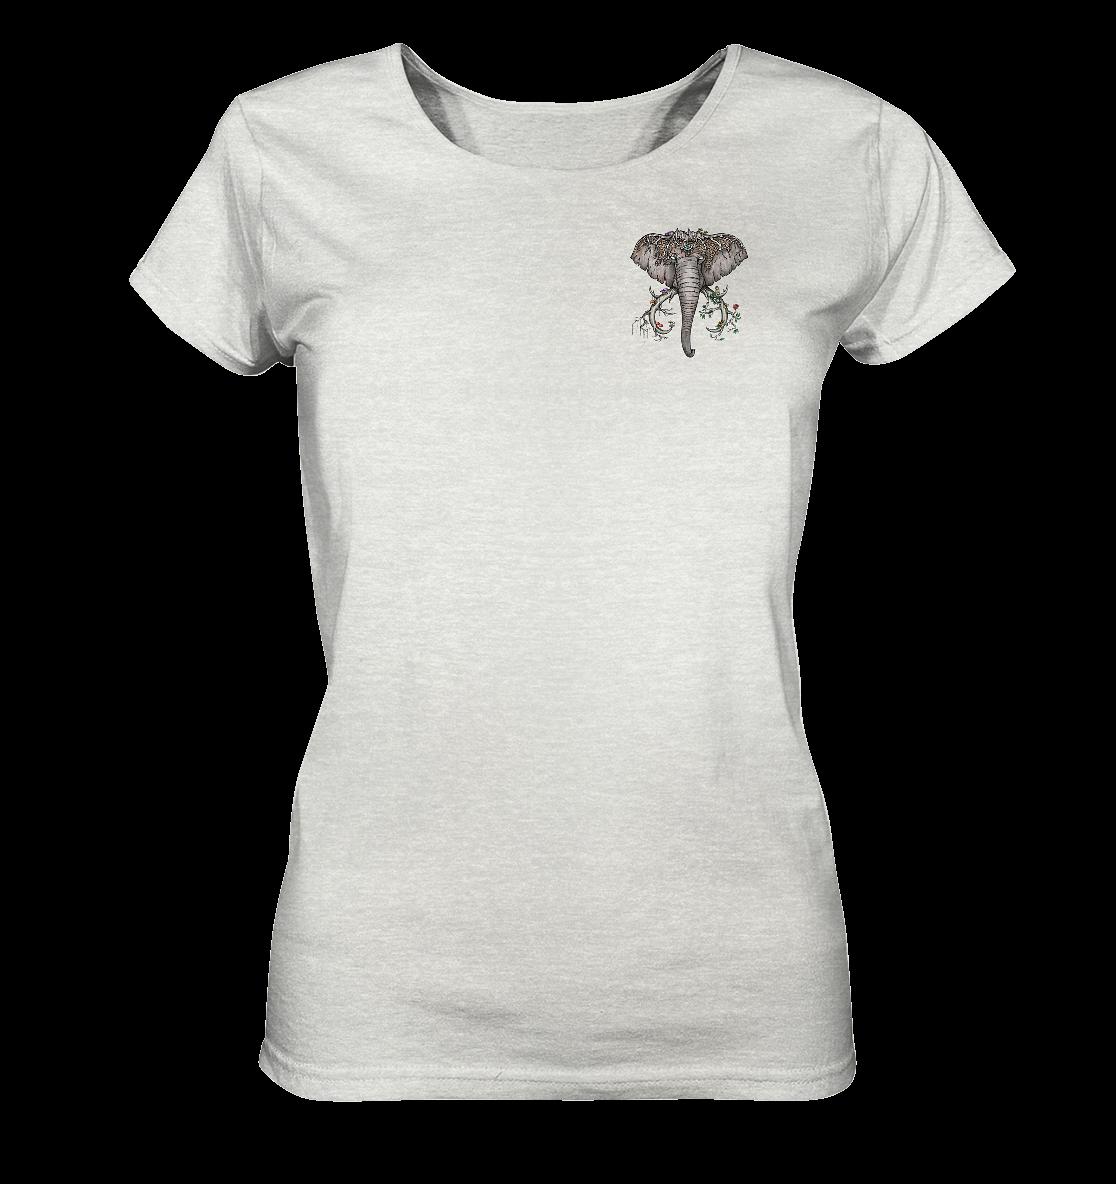 front-ladies-organic-shirt-meliert-f2f5f3-1116x-3.png